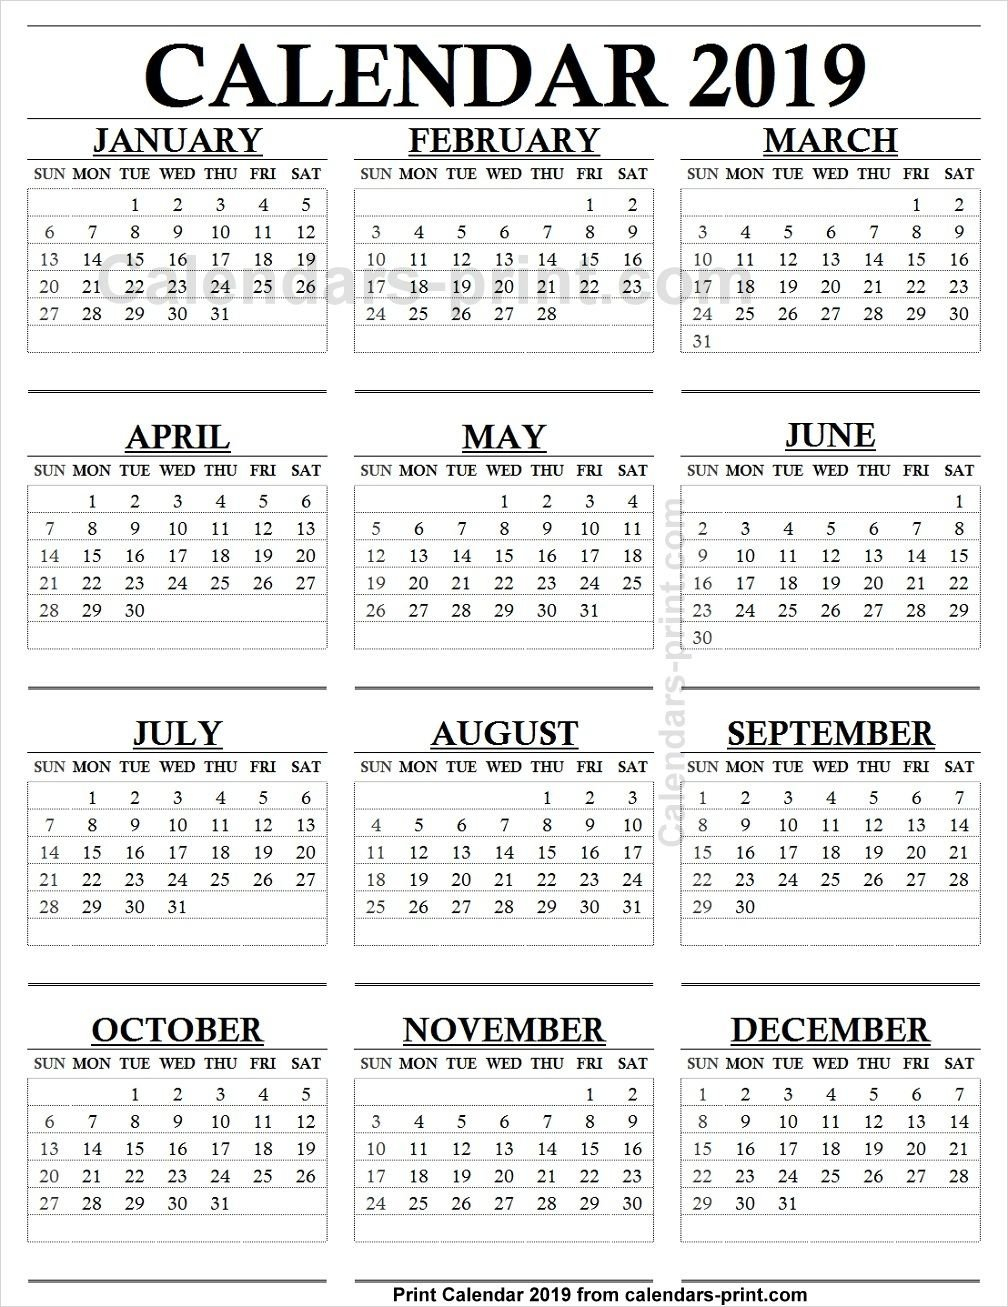 12 Month Calendar 2019 One Page   2019 Yearly Calendar   12 Month Calendar 2019 Liga Mx